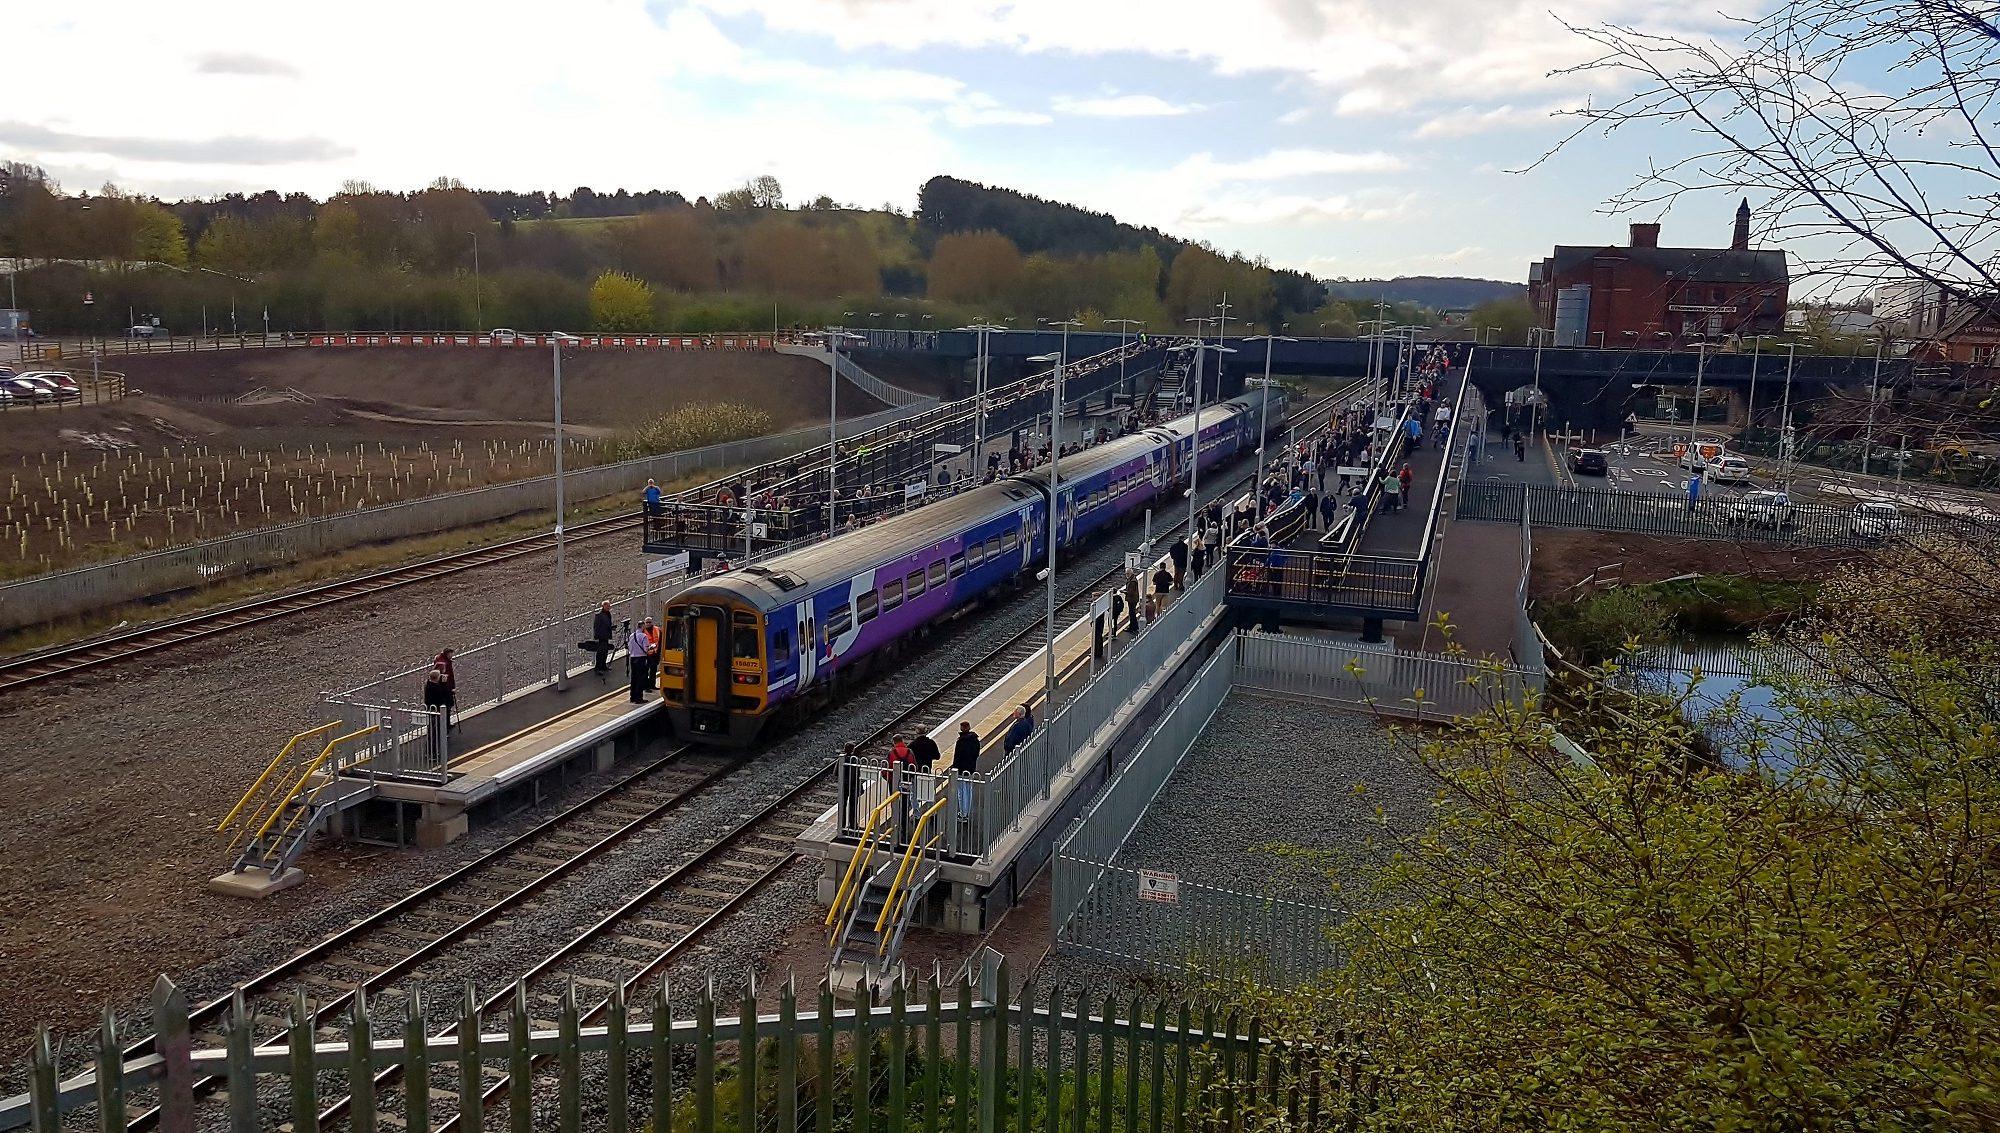 Evergrip End of Platform Stairs at llkeston Railway Station